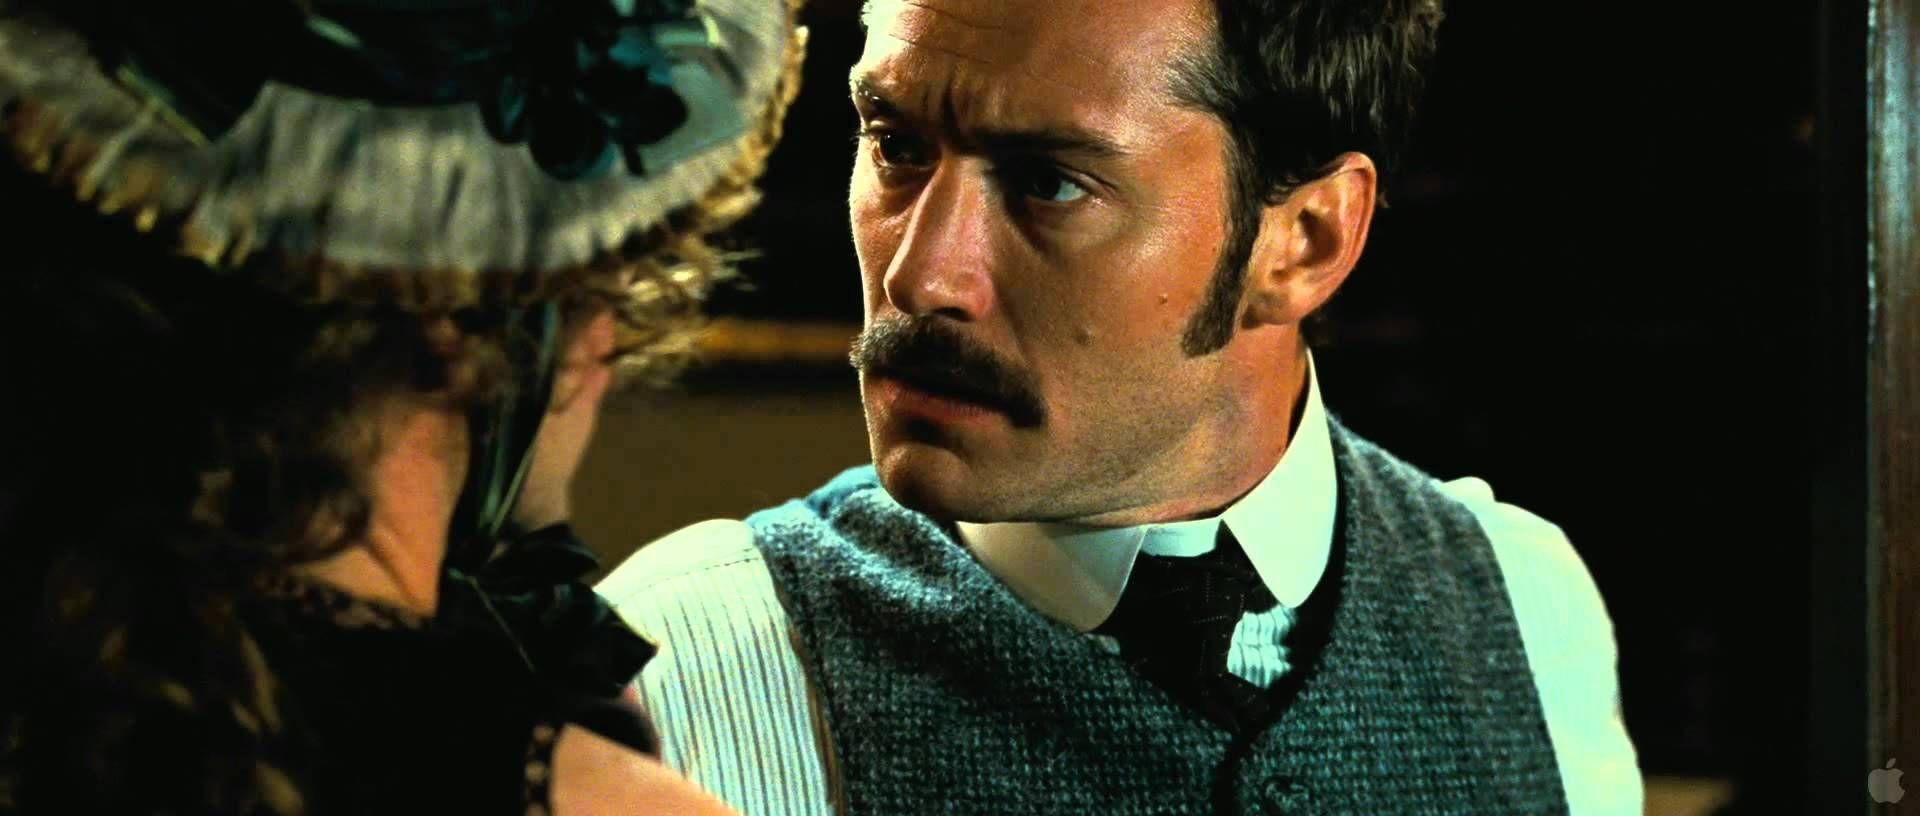 Sherlock Holmes: A Game of Shadows - Trailer 1 - (1080p HD)